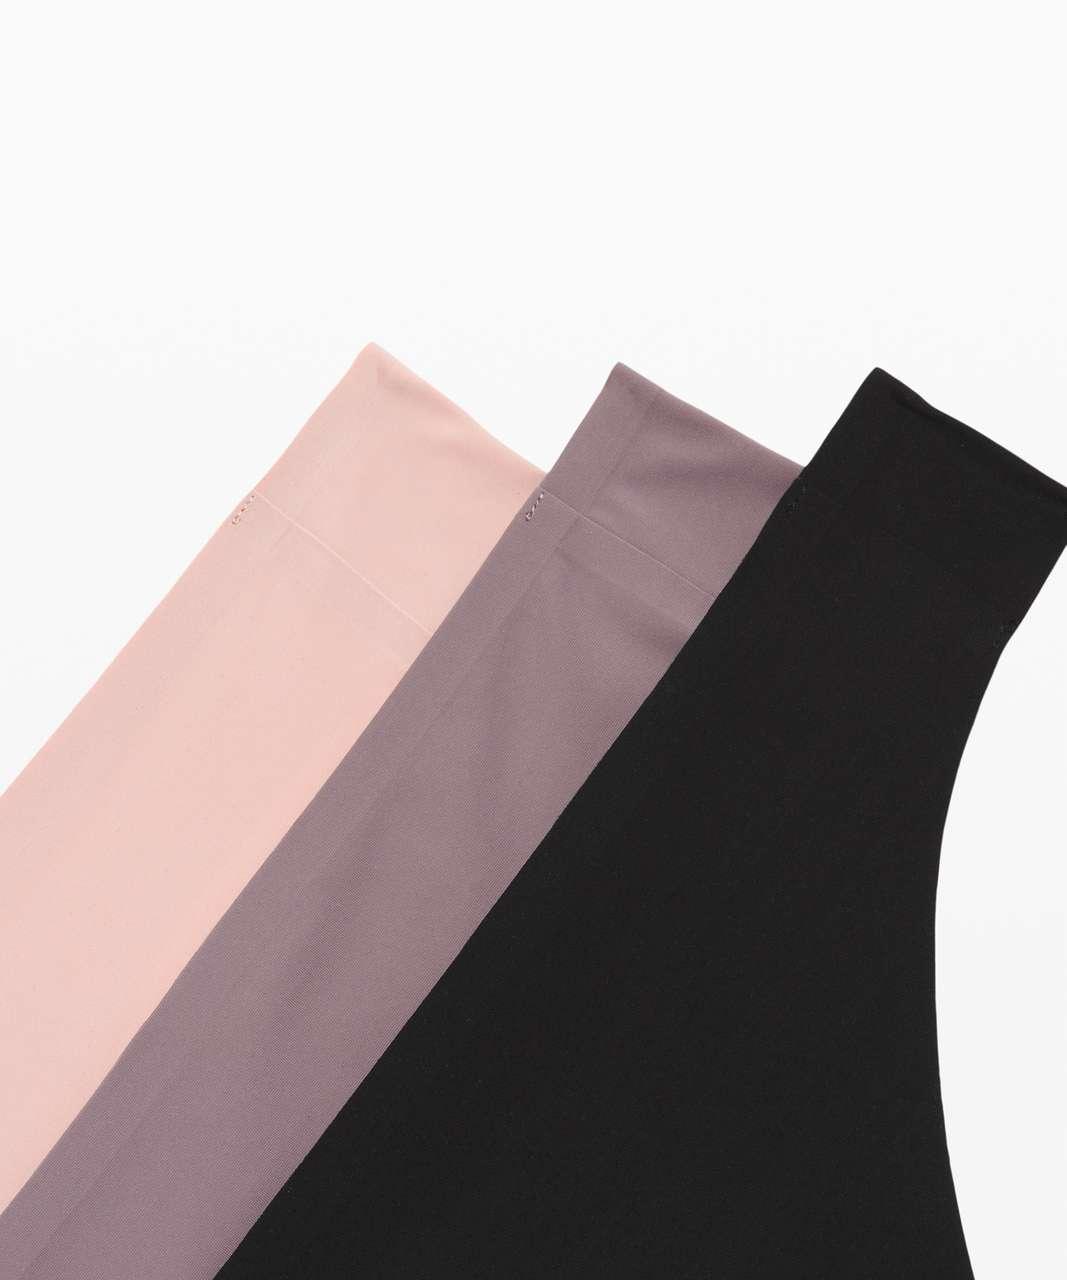 Lululemon Namastay Put Thong 3 Pack - Black / Misty Shell / Lunar Rock